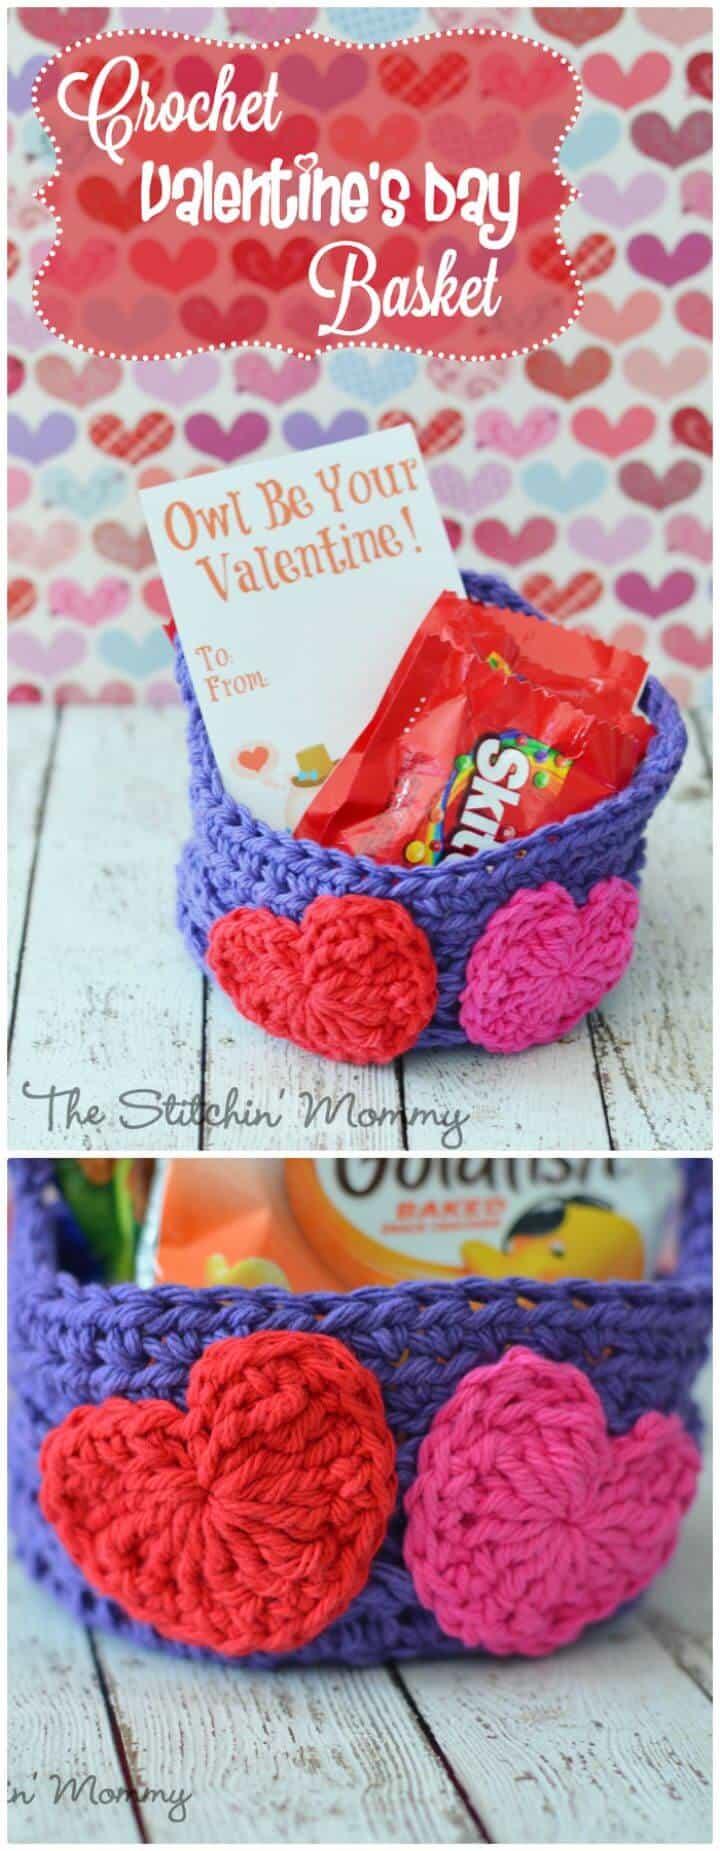 Easy Free Crochet Valentine'S Day Basket Pattern